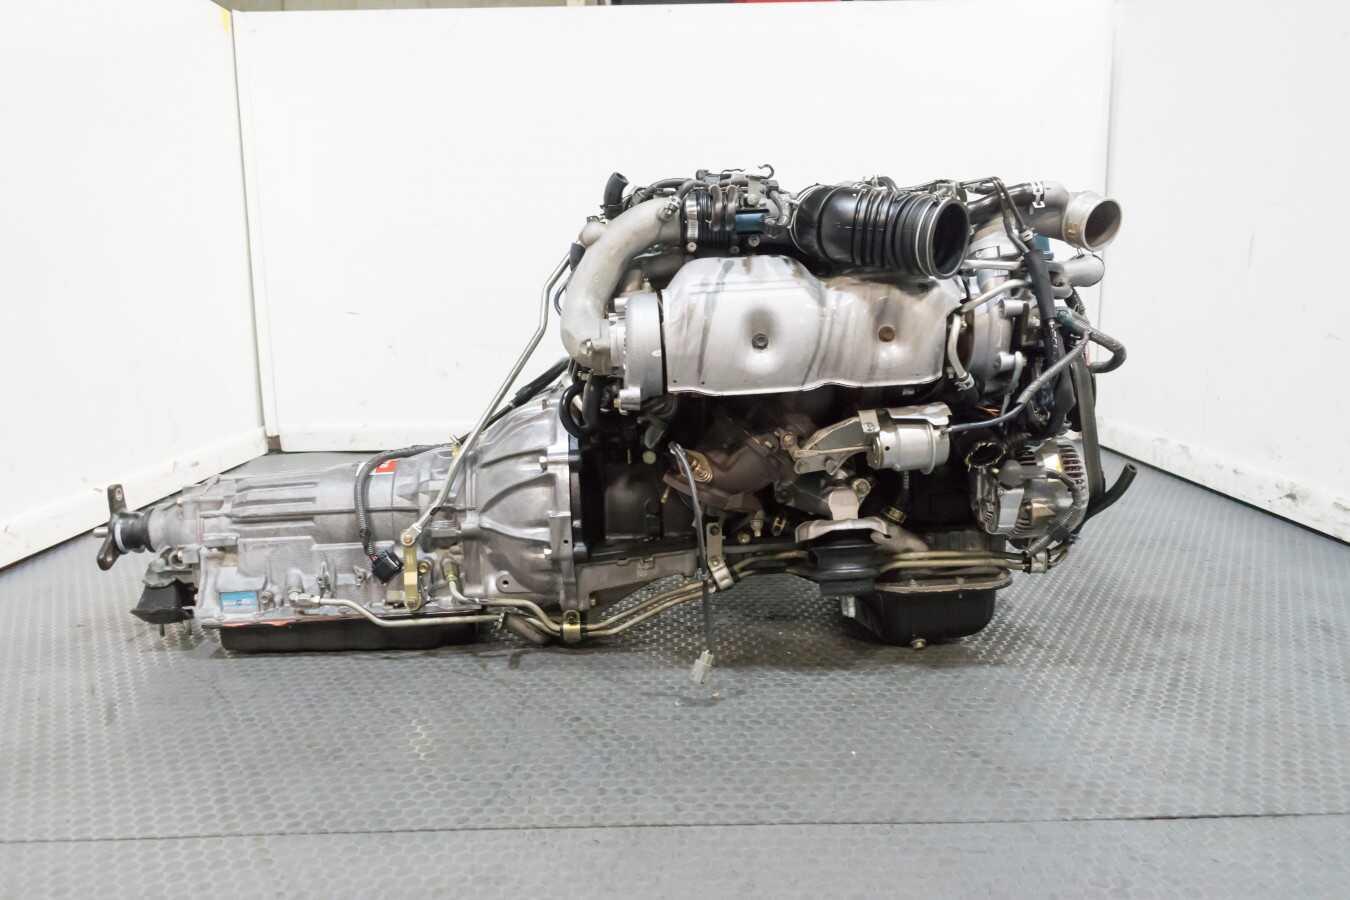 Clean Jdm Toyota Aristo Front Sump 2jz Twin Turbo Vvti